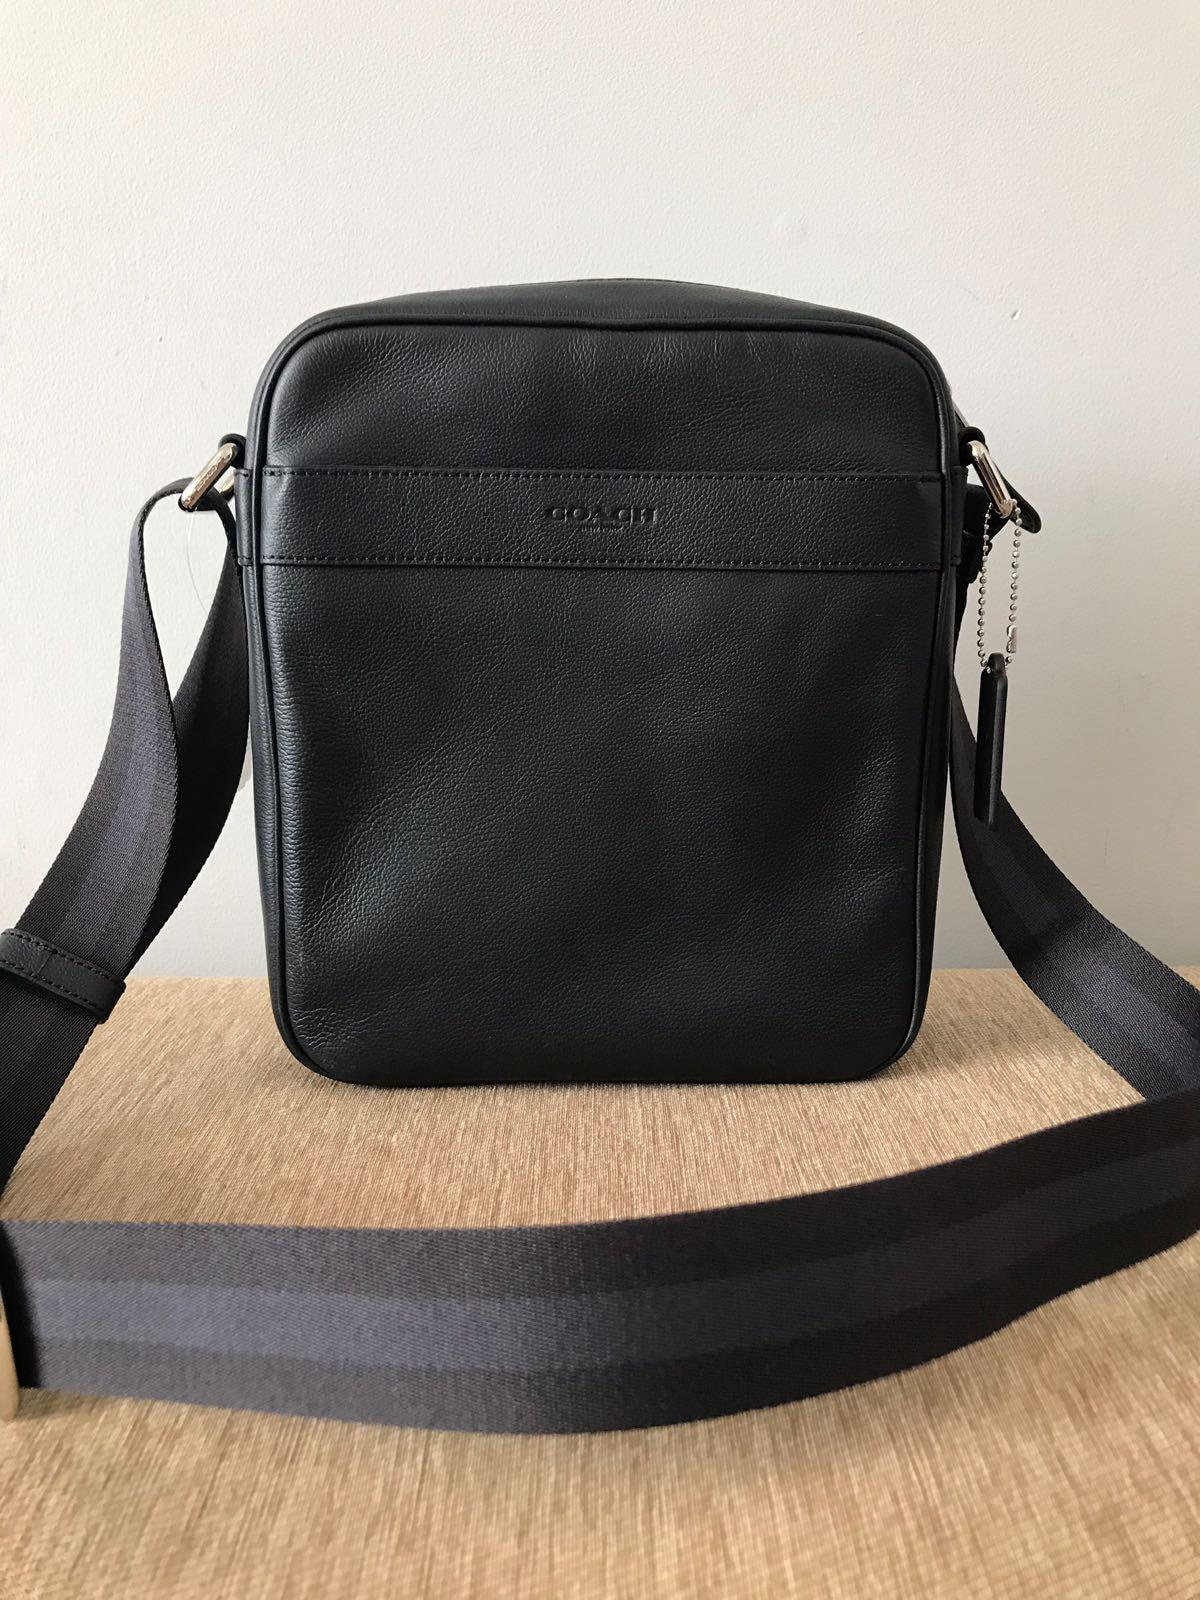 ... italy coach mens flight bag smith leather crossbody black. view  detailed images 3 d1932 0788f 55461f5499e4e